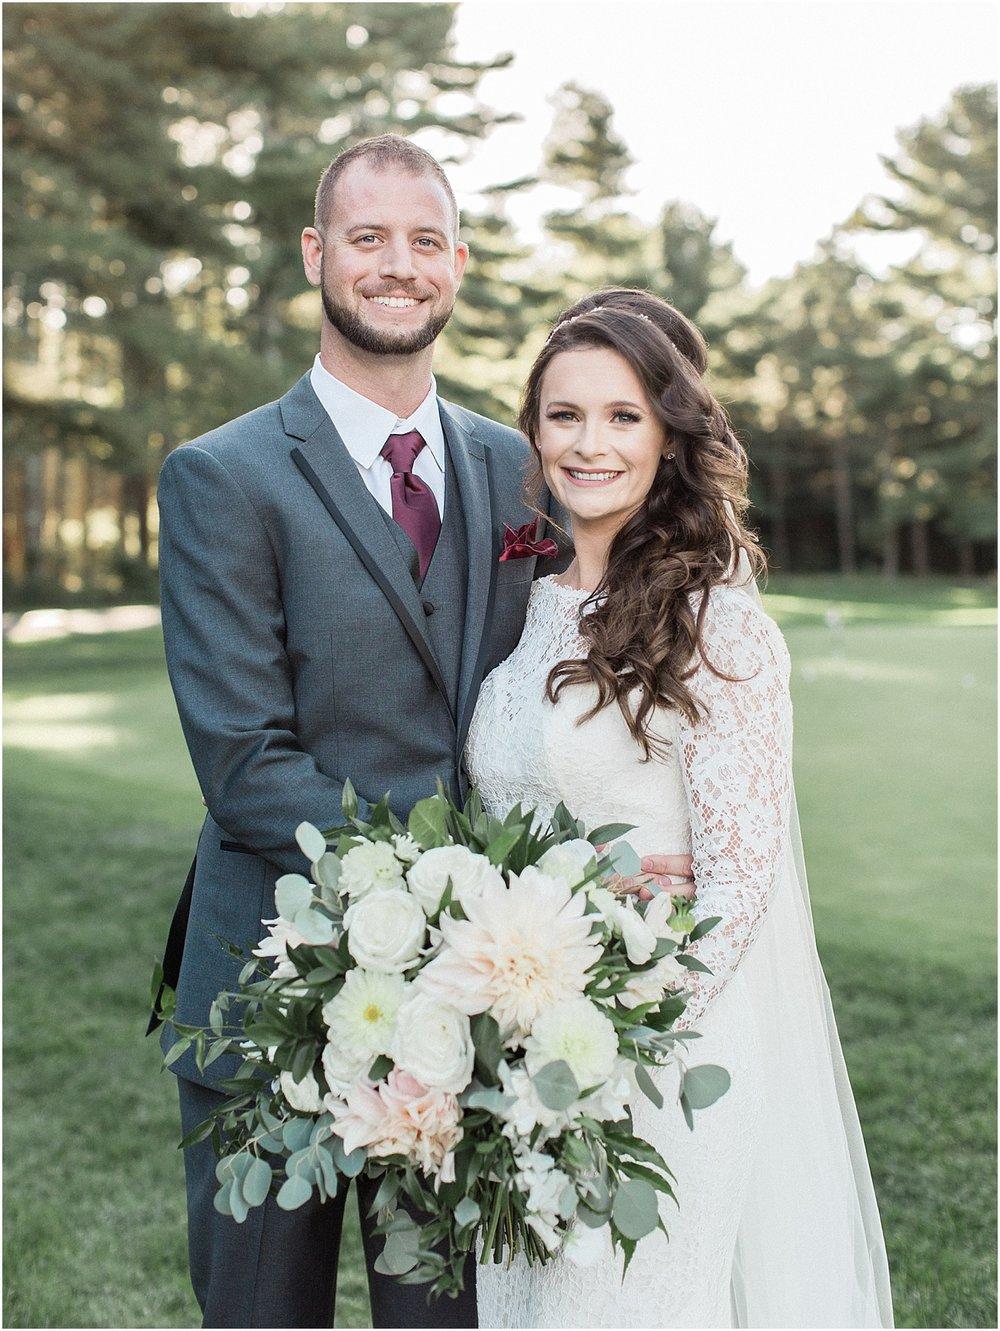 christina_frank_the_pavilion_at_pine_hills_fall_wine_cape_cod_boston_wedding_photographer_meredith_jane_photography_photo_1238.jpg